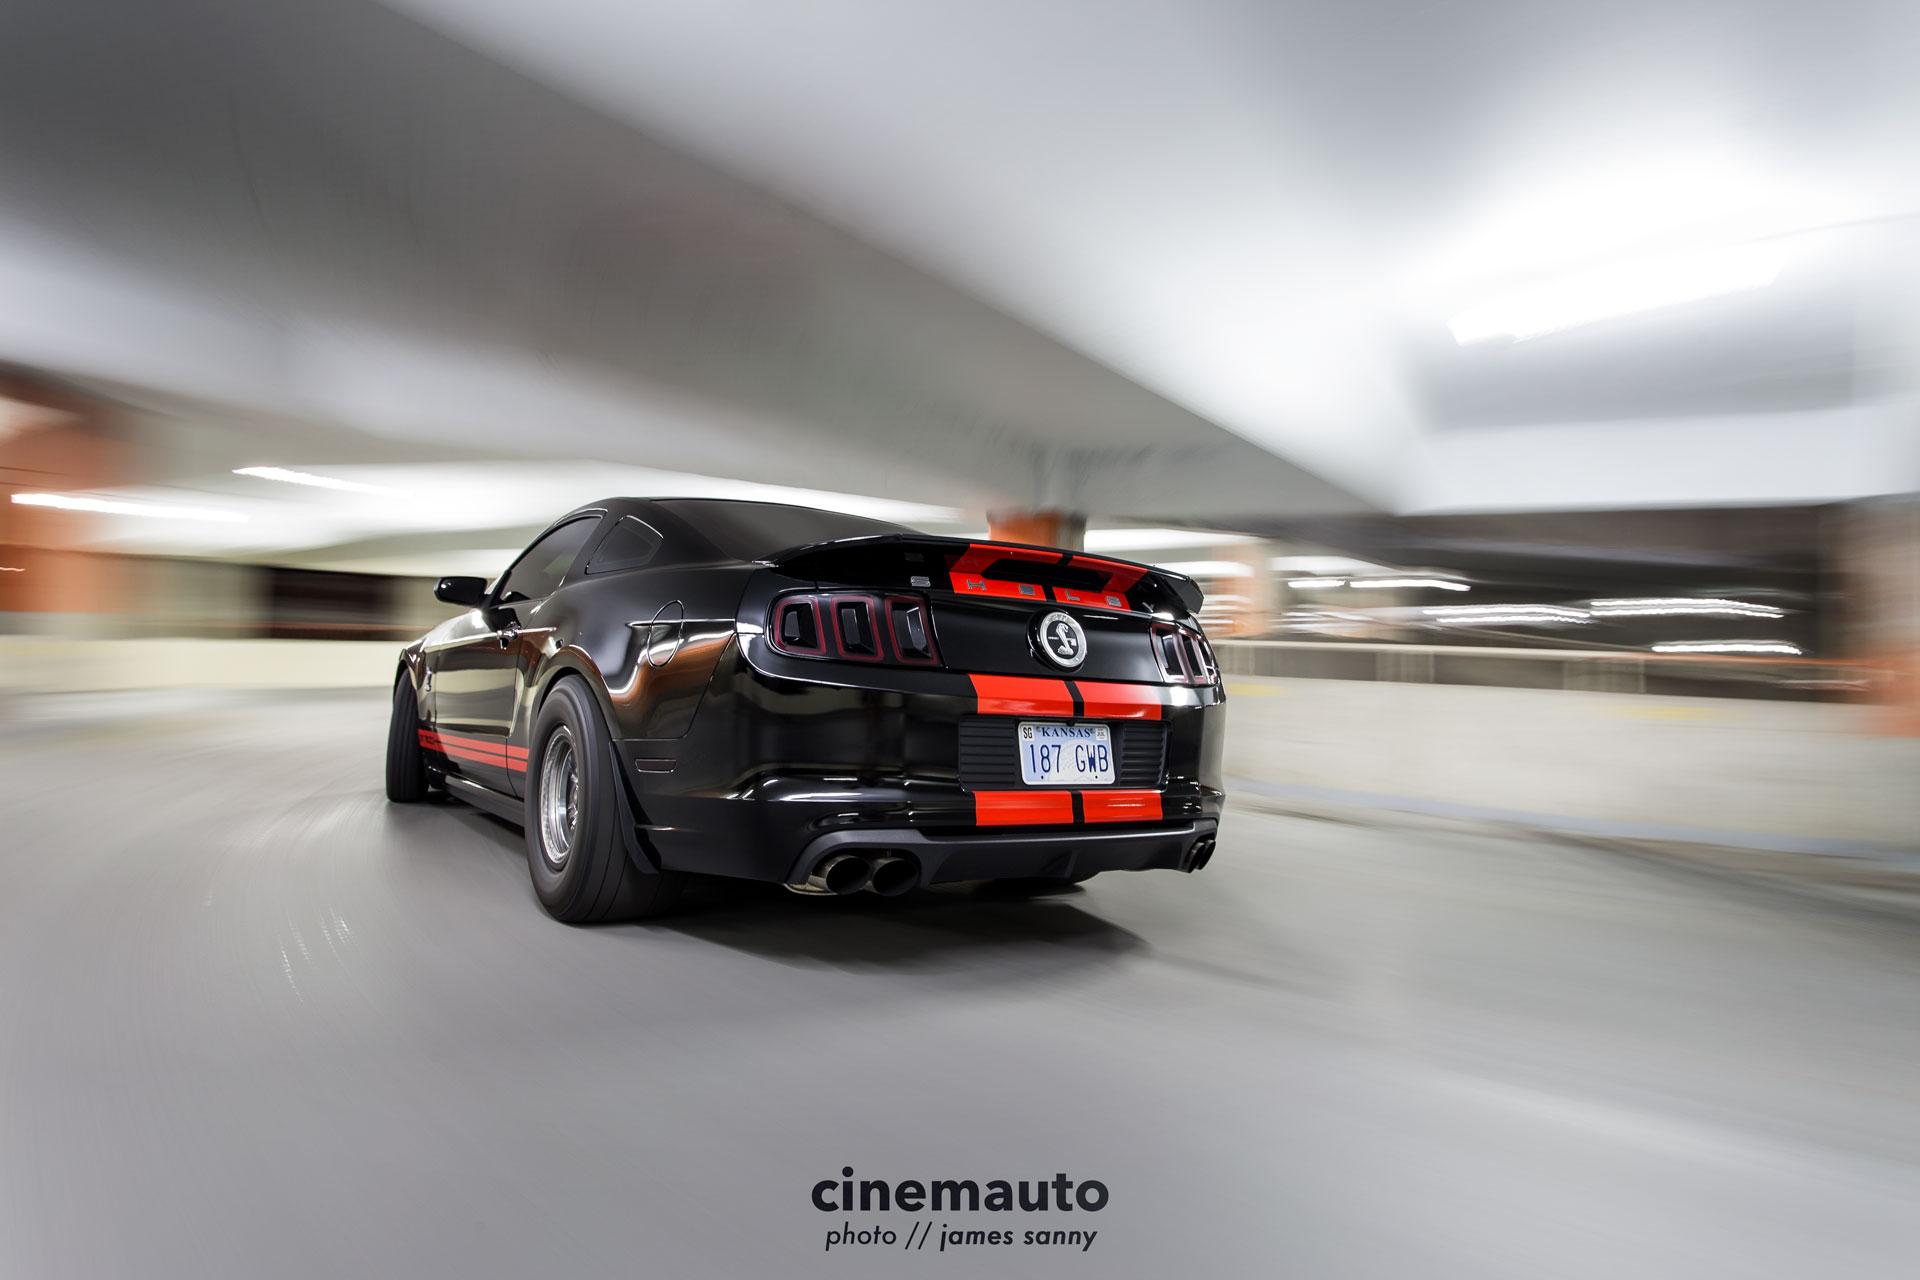 cinemauto-wichita-autmotive-photography-cj25a.jpg